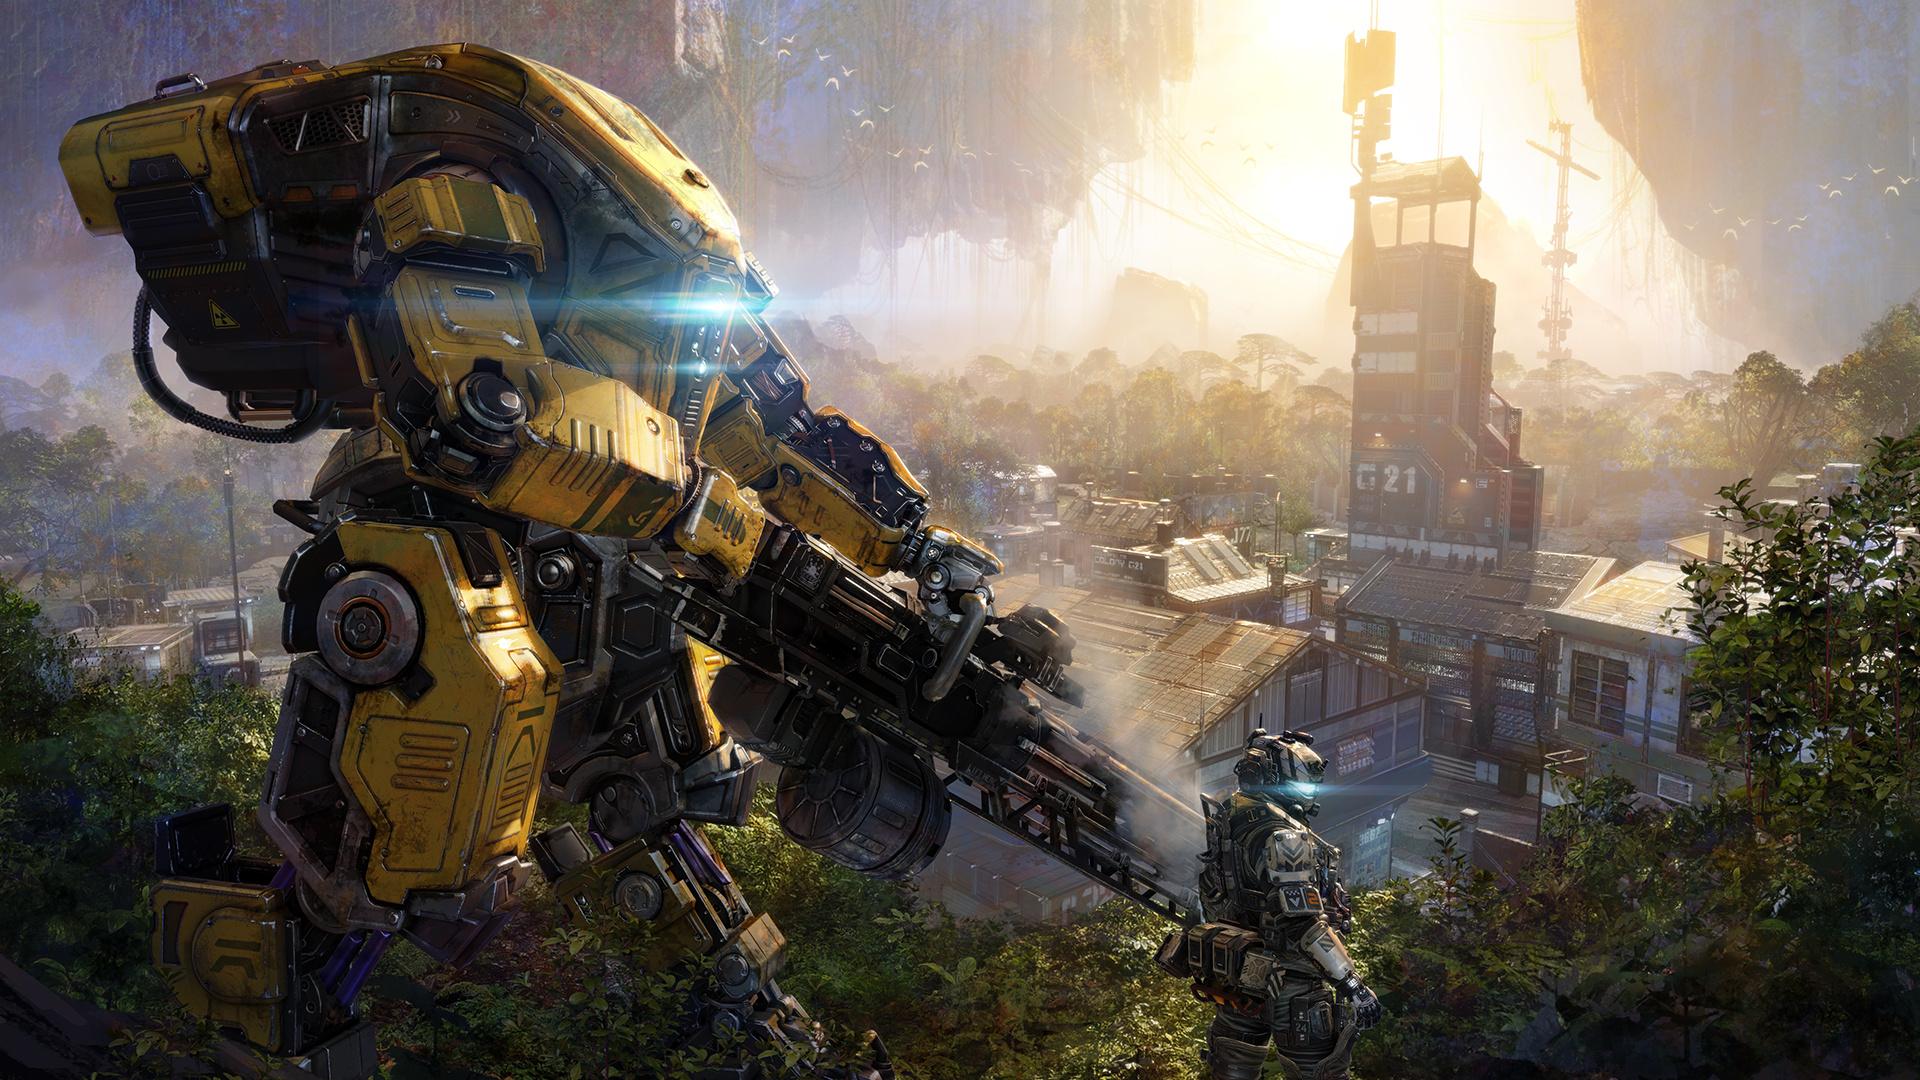 Распродажа в PlayStation Store: Battlefield, Titanfall2, Call of Duty и другие